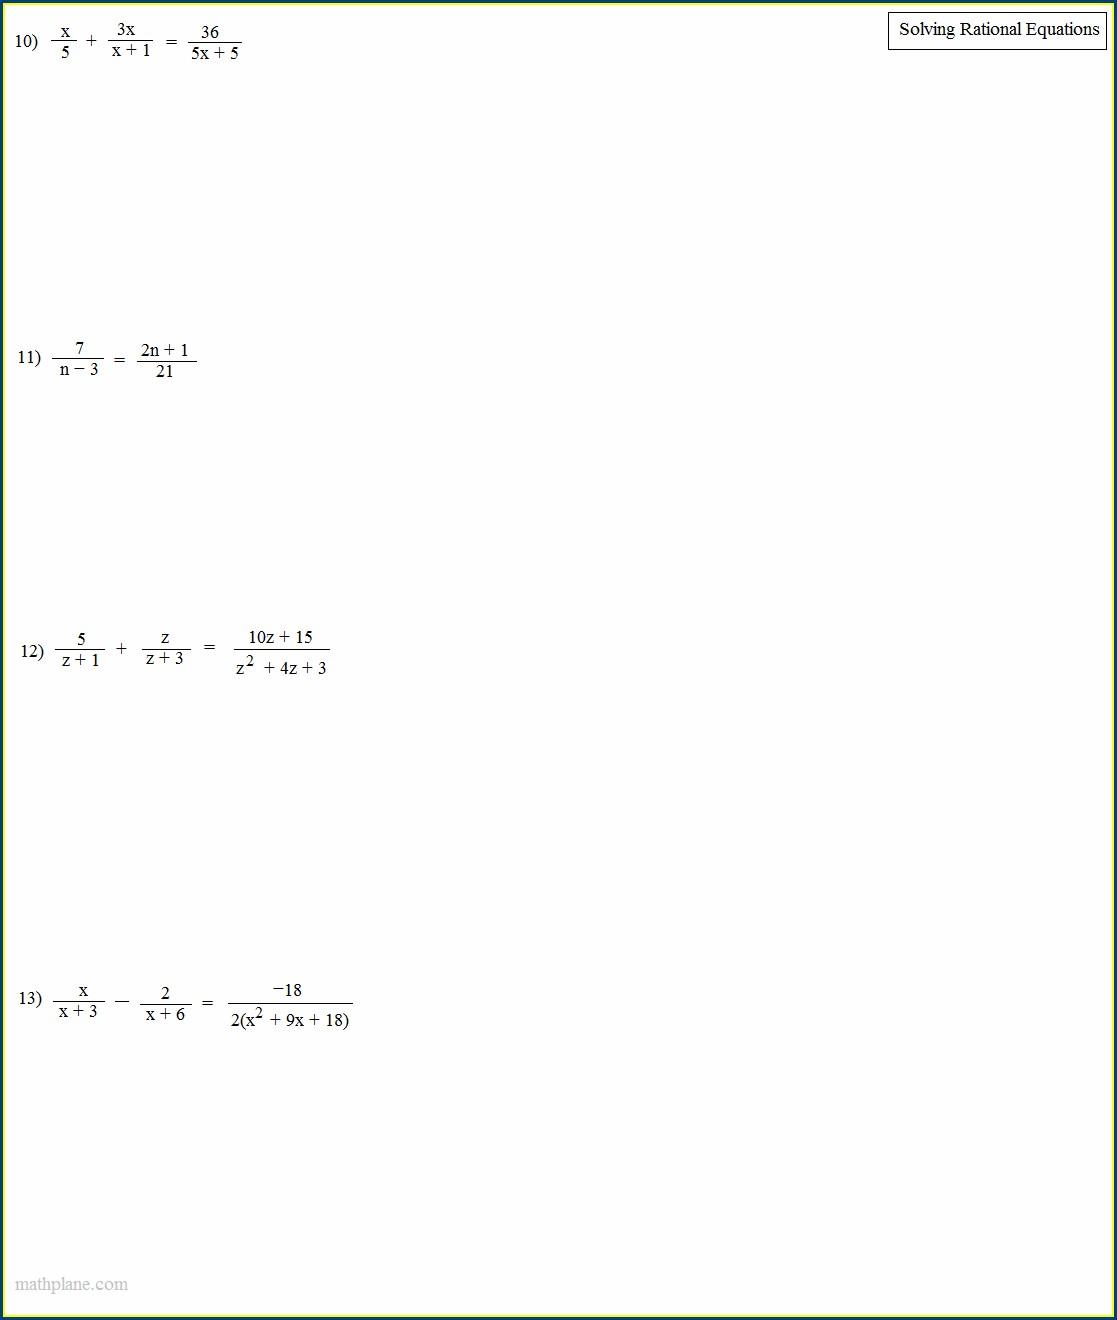 Solving Rational Equations Word Problems Worksheet